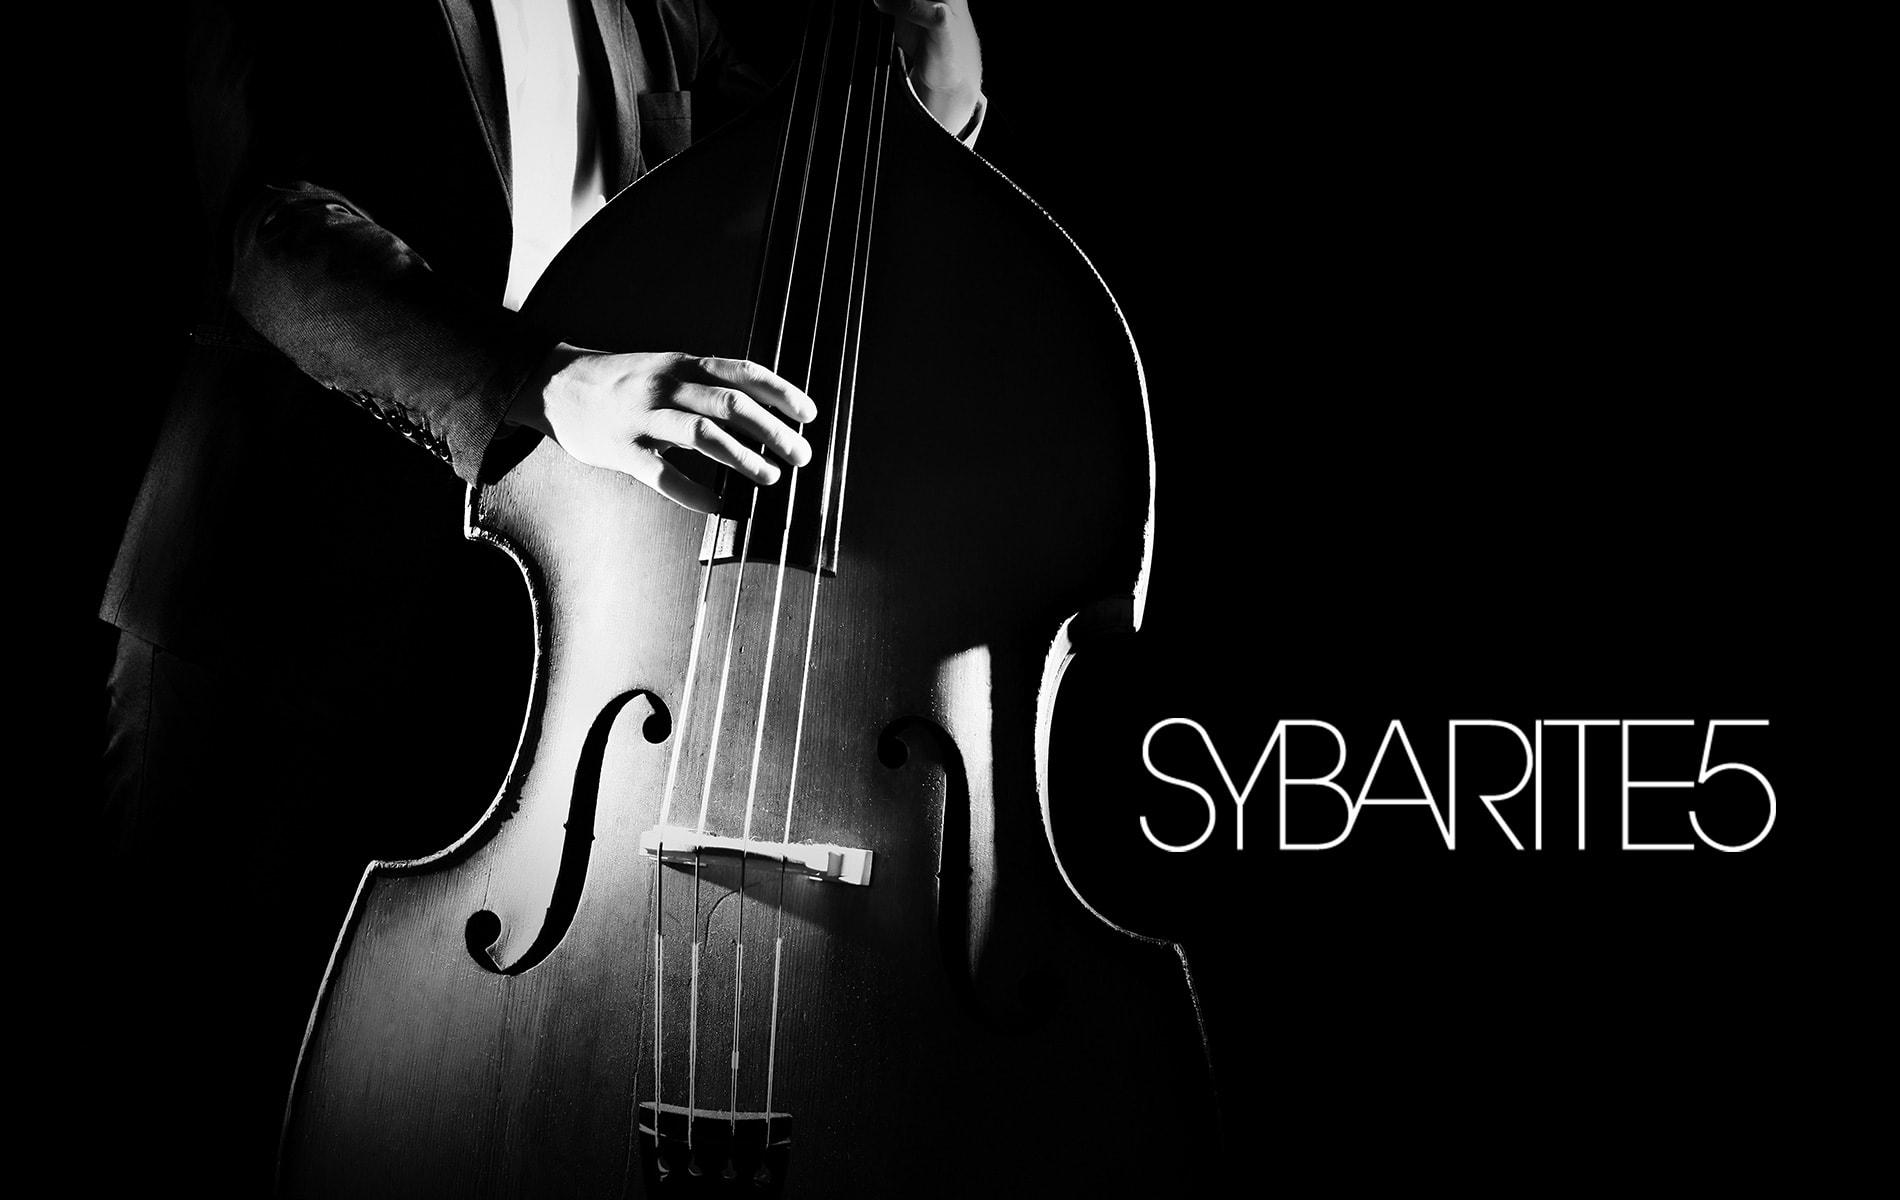 Sinfonia Gulf Coast Sybarite5